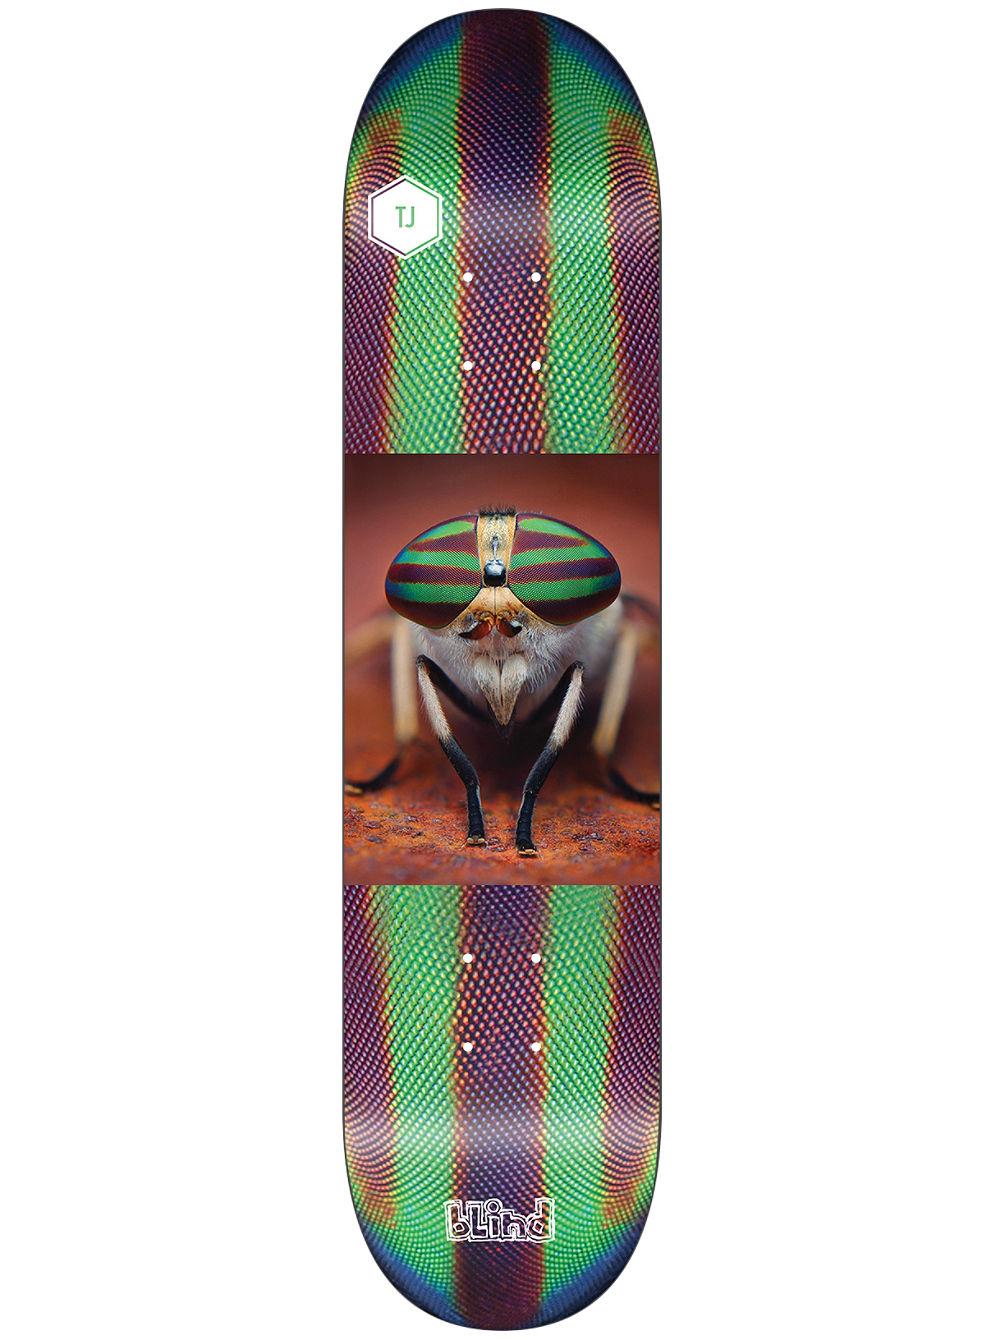 blind-buggers-r7-825-tj-rogers-deck